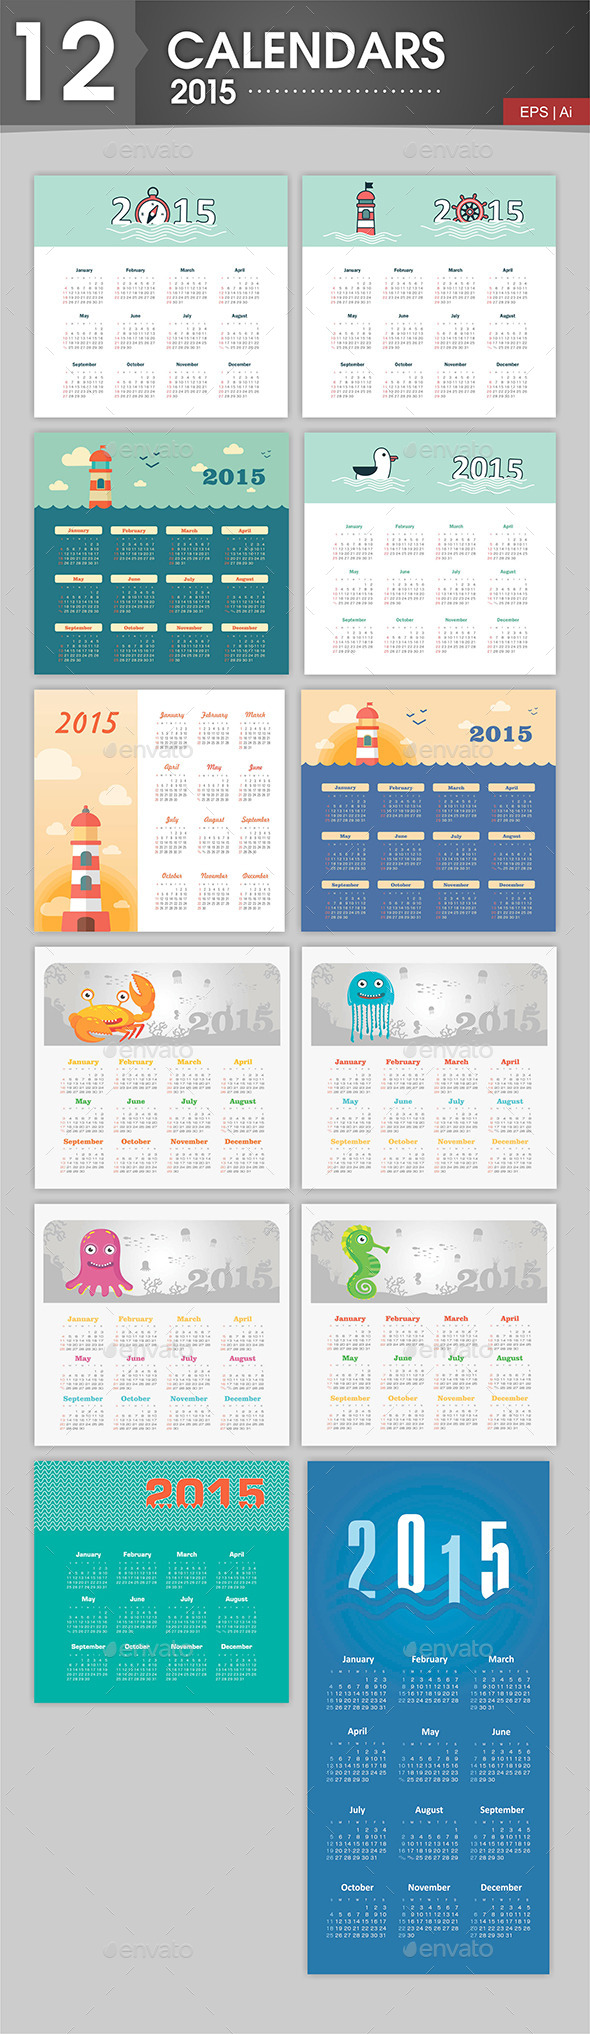 12 Calendars 2015 Marine Theme - Miscellaneous Vectors